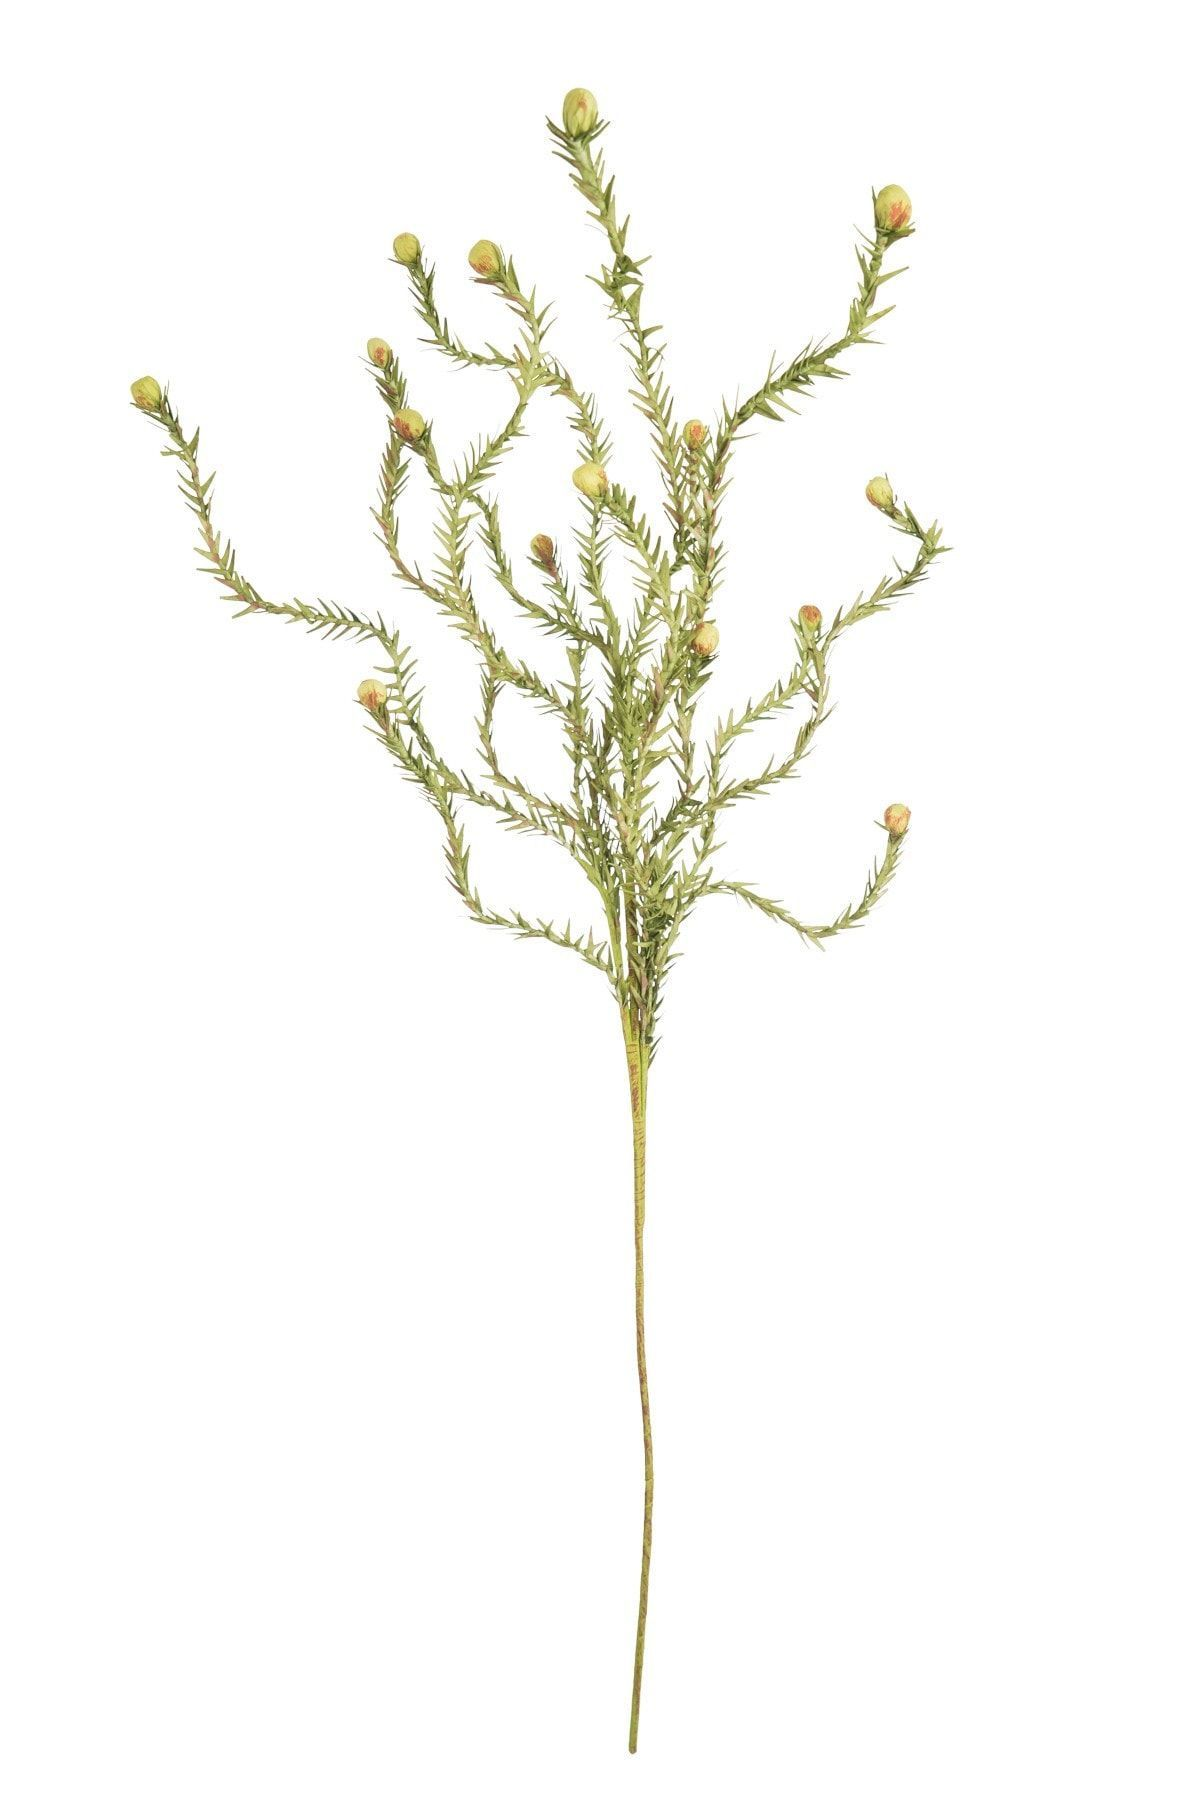 Botanica #2124 | Botanica, Botanical drawings, Rustic ...